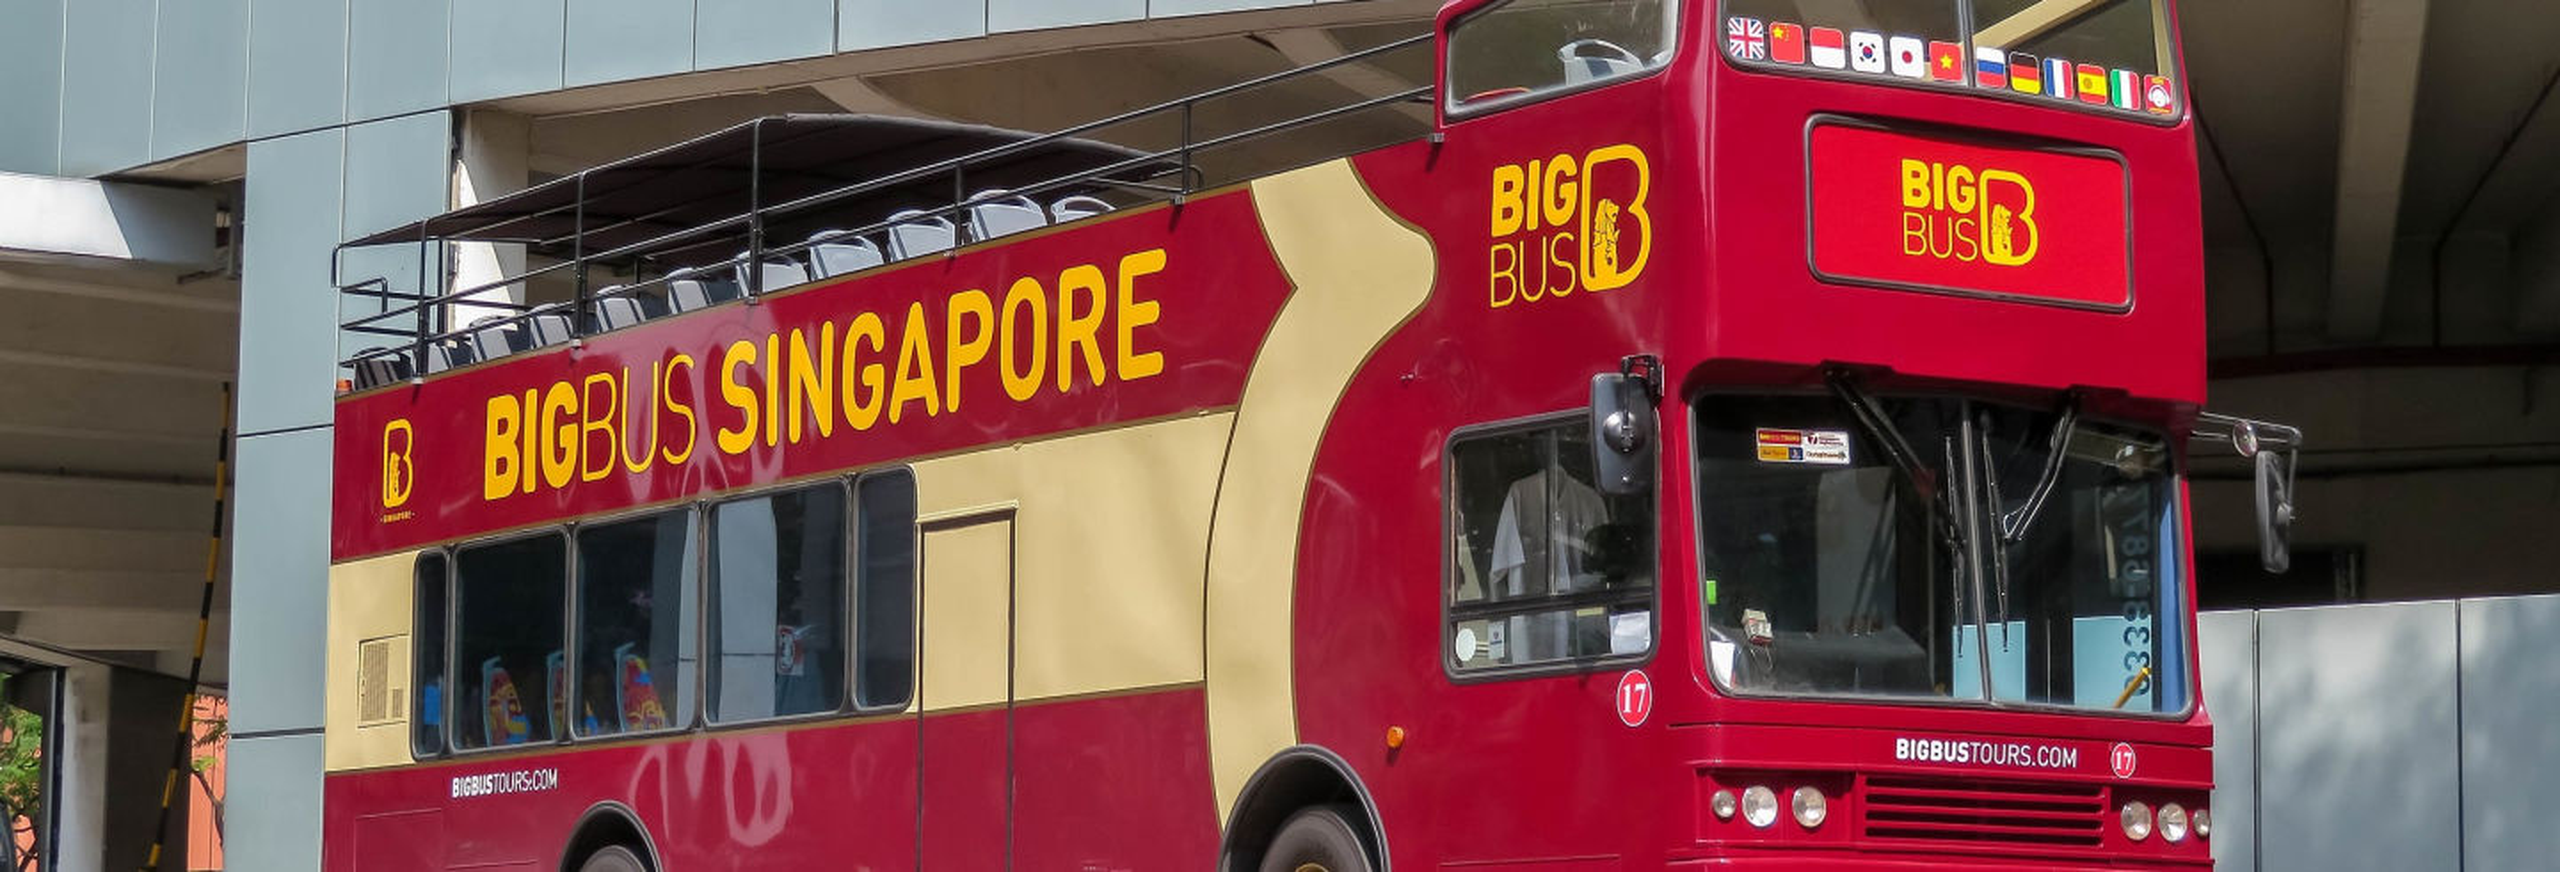 Autobus turistico di Singapore